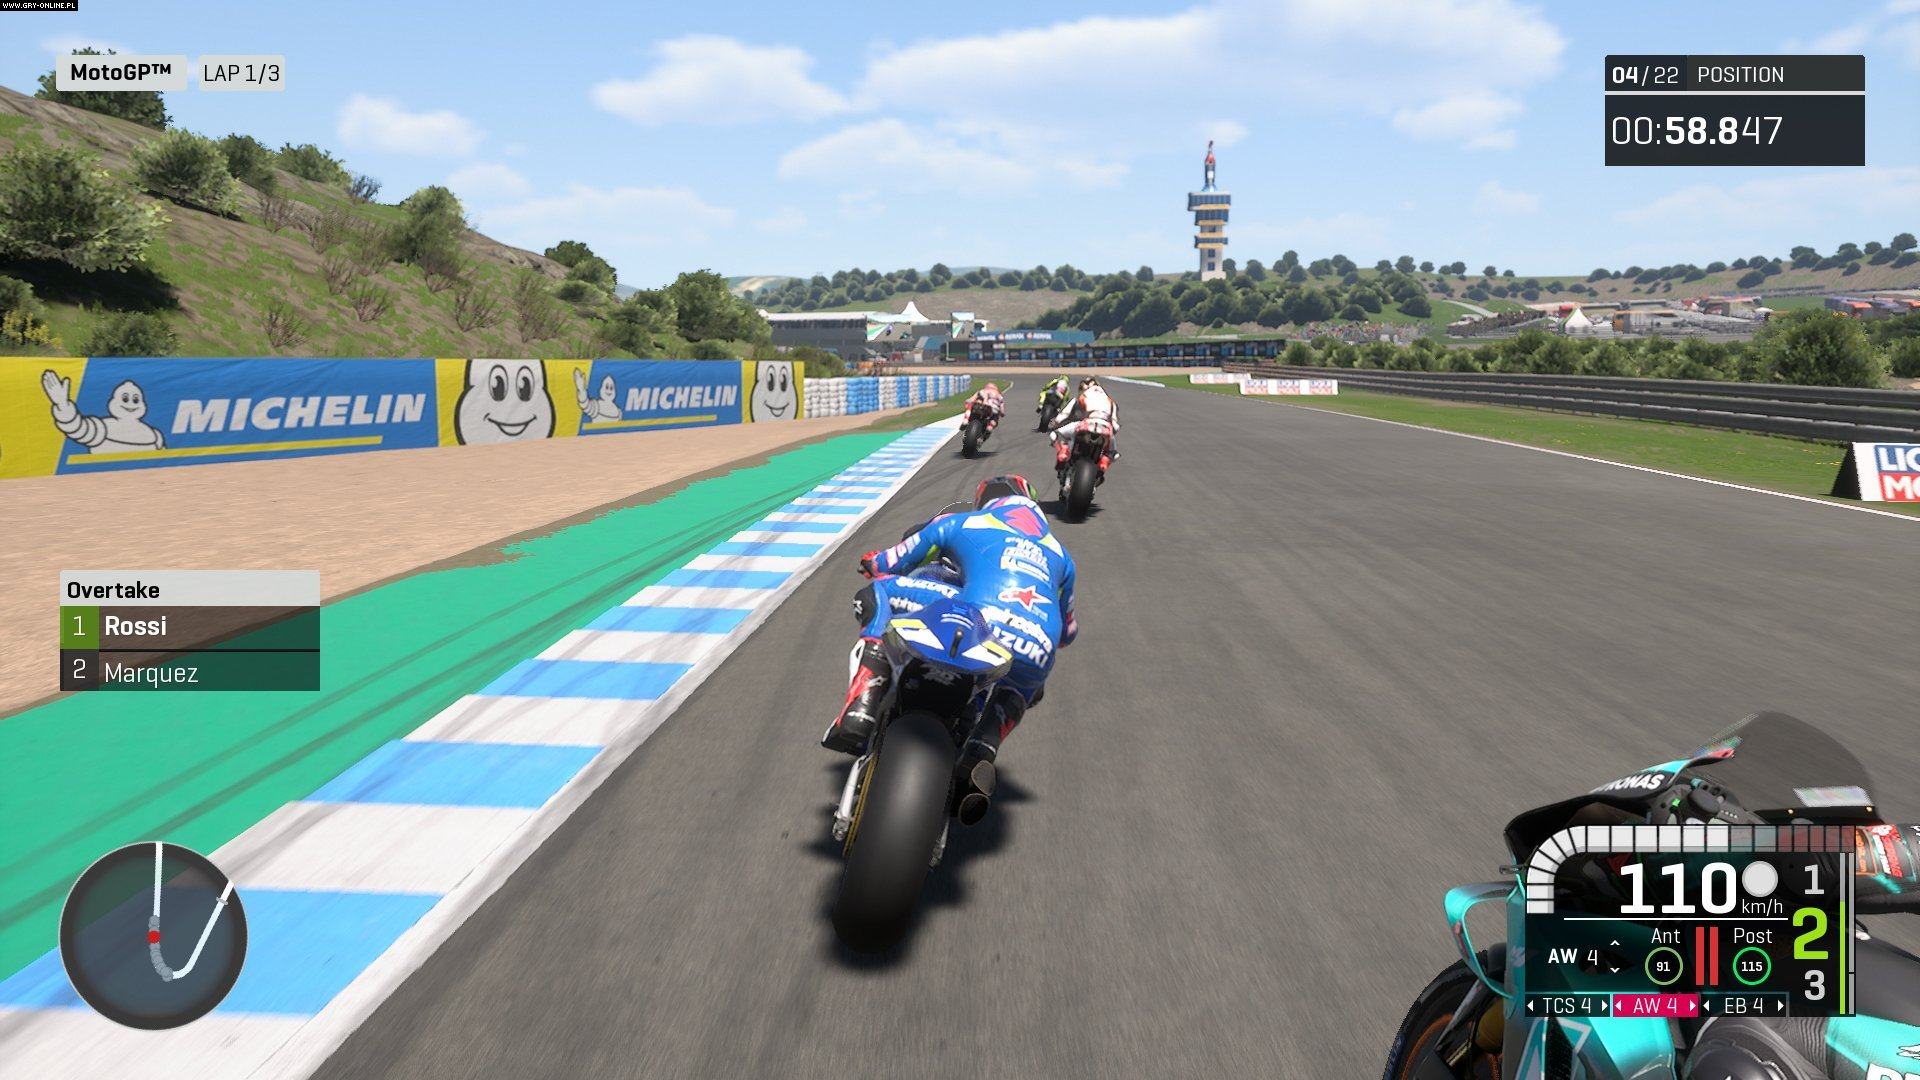 MotoGP 19 PC, PS4, XONE, Switch Games Image 4/15, Milestone